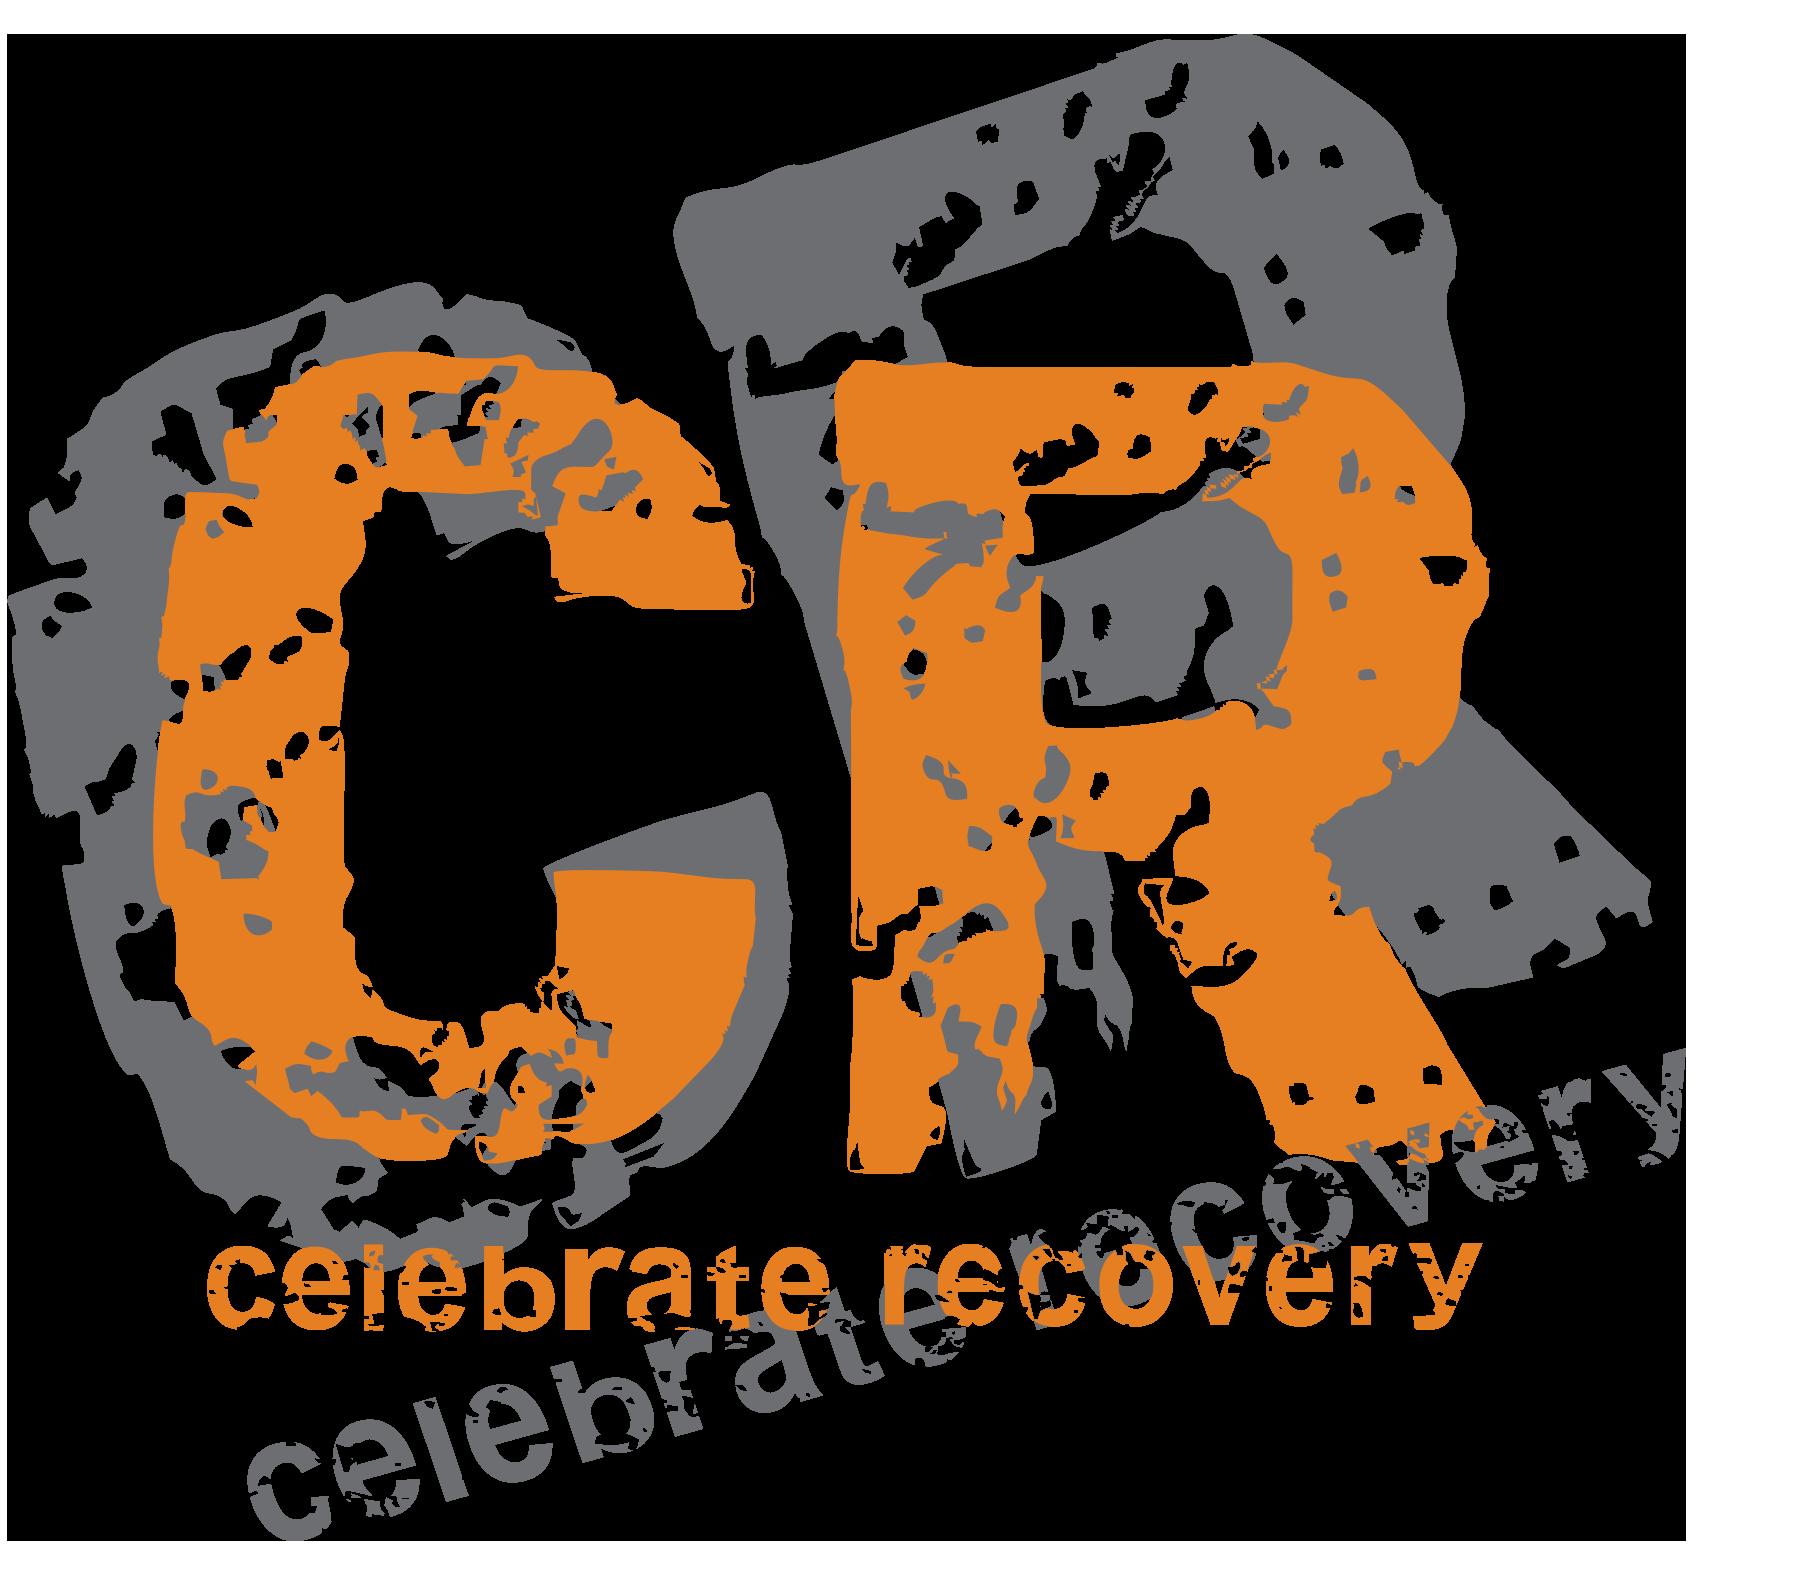 Celebrate Recovery Logos